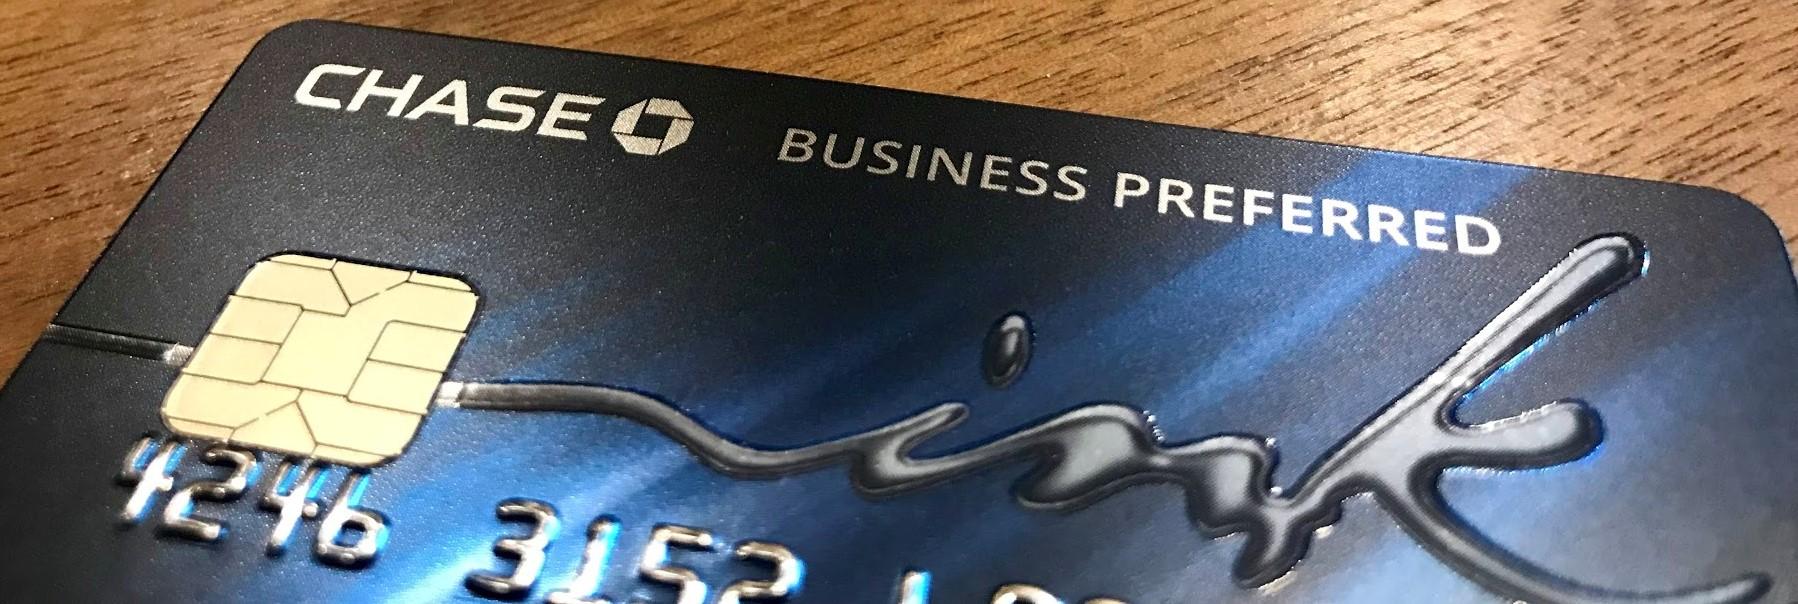 chase ink business preferred 100k ultimate rewards on